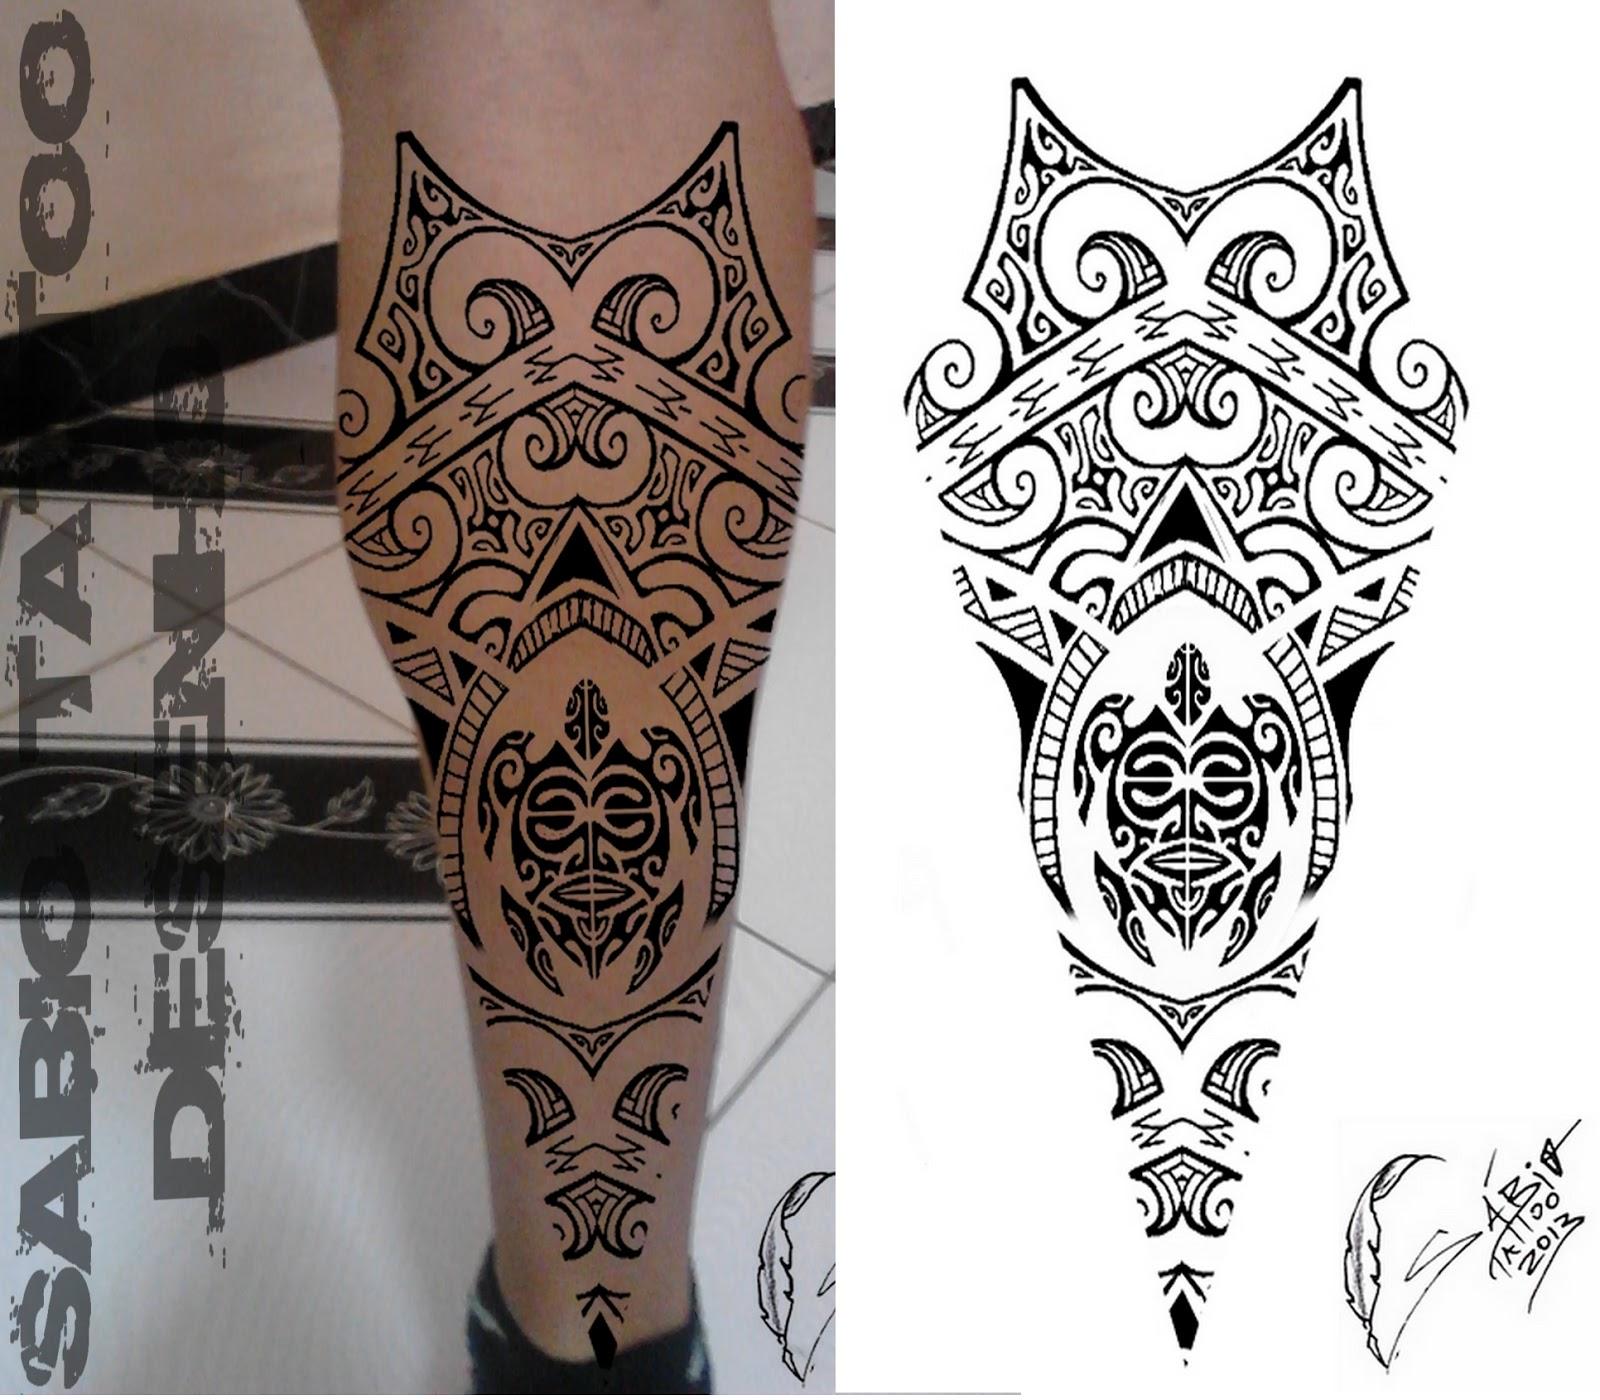 Sabio Tattoo Tatuagem Profissional Tatuagem Maori Panturrilha